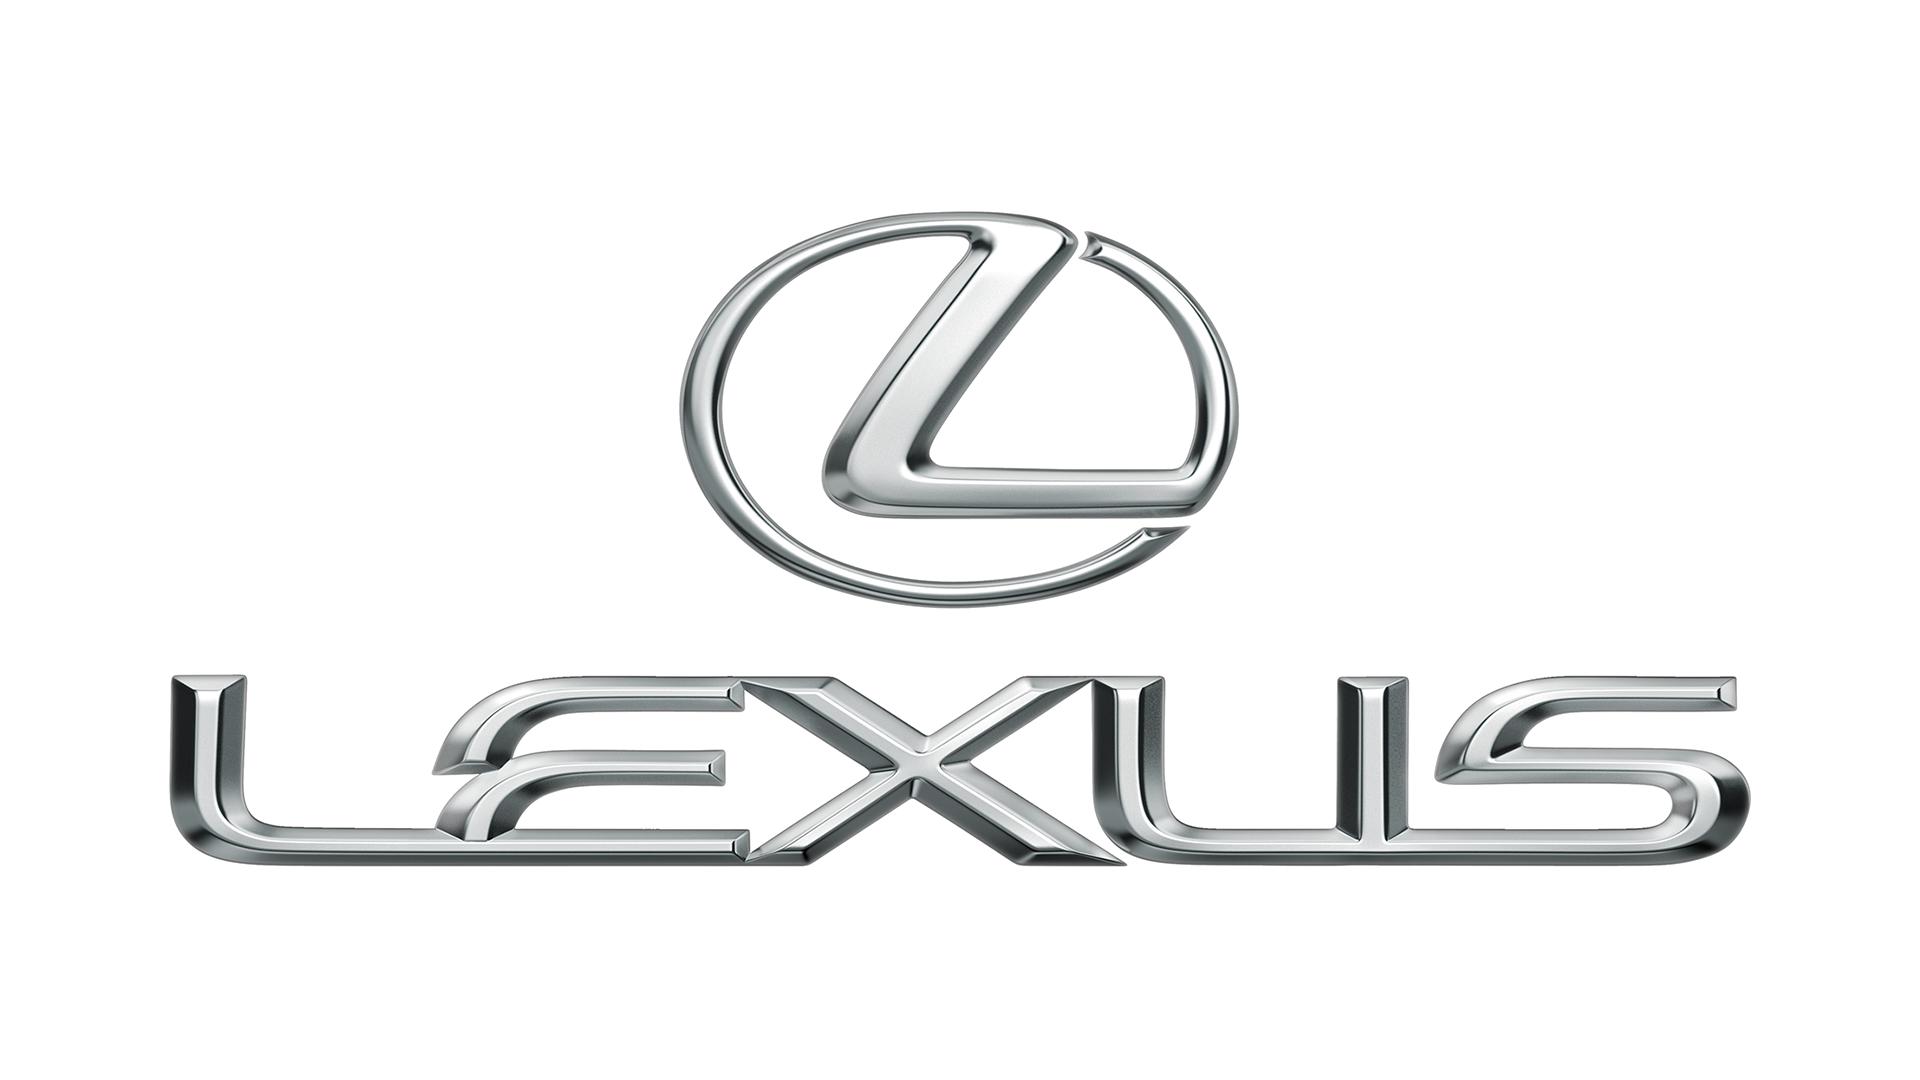 Lexus Logo Present 1920x1080 Hd Png Lexus Logo Car Logos Car Brands Logos